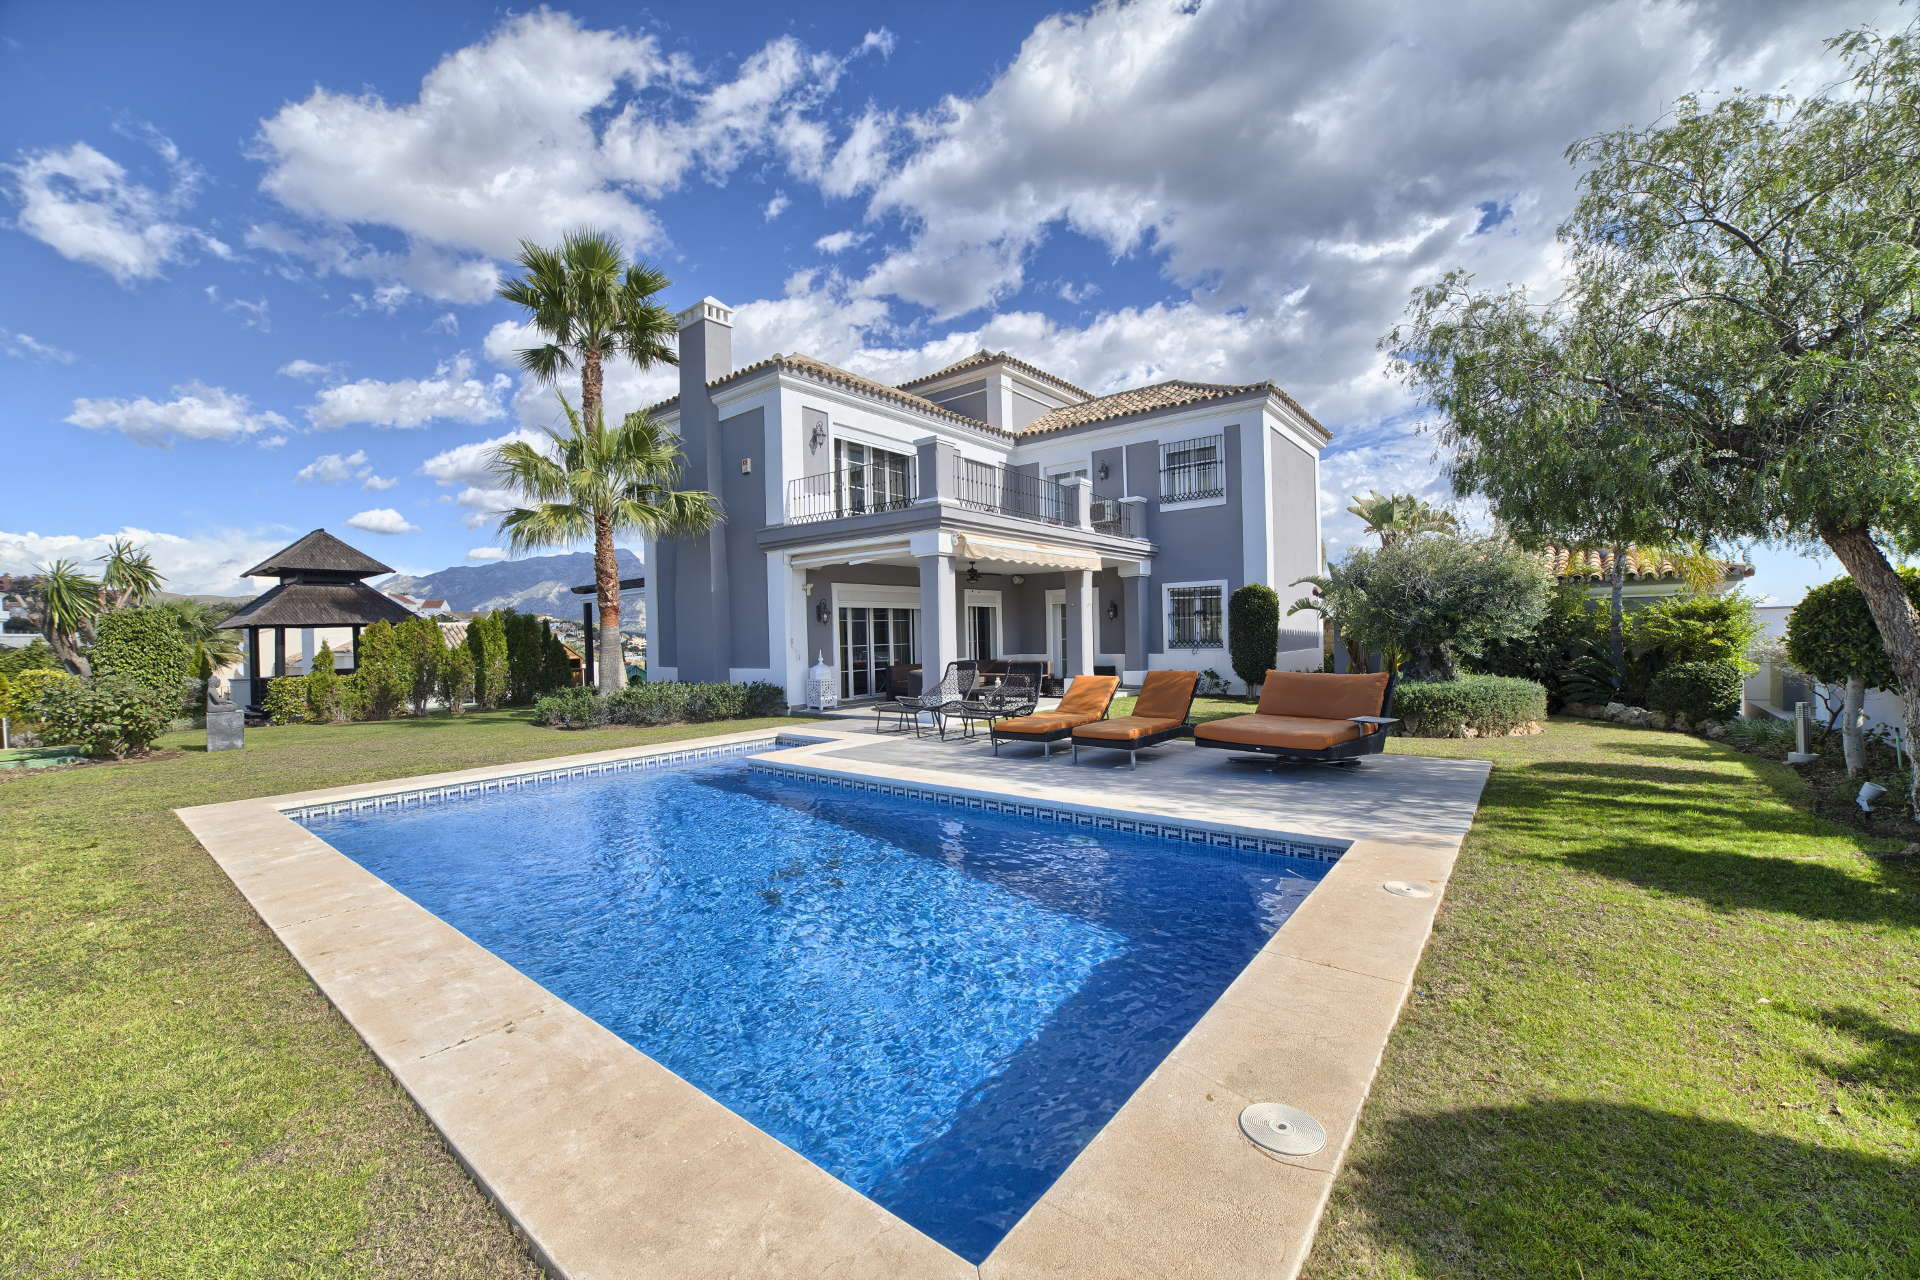 Family villa Puerto del Capitan Benahavis with fantastic views for sale